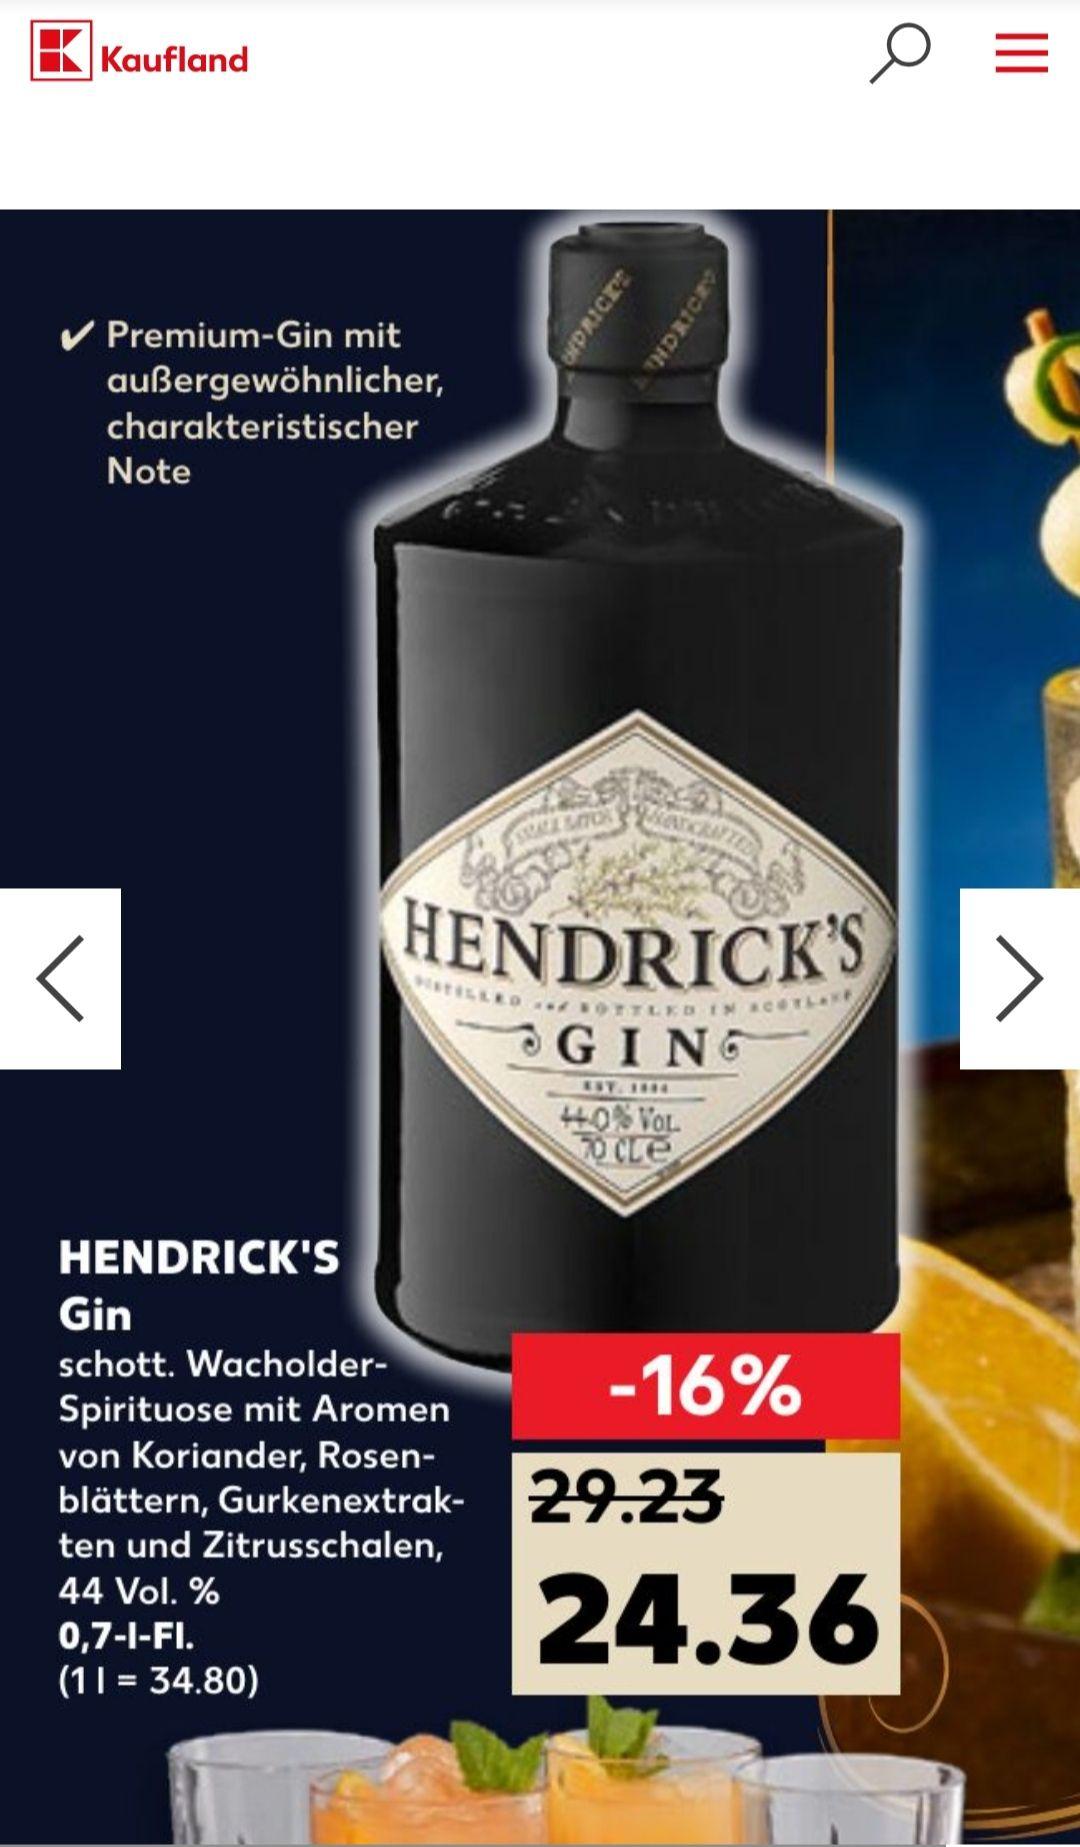 [Lokal/Kaufland/Jena] Hendrick's Gin 0,7l, 44% Vol.